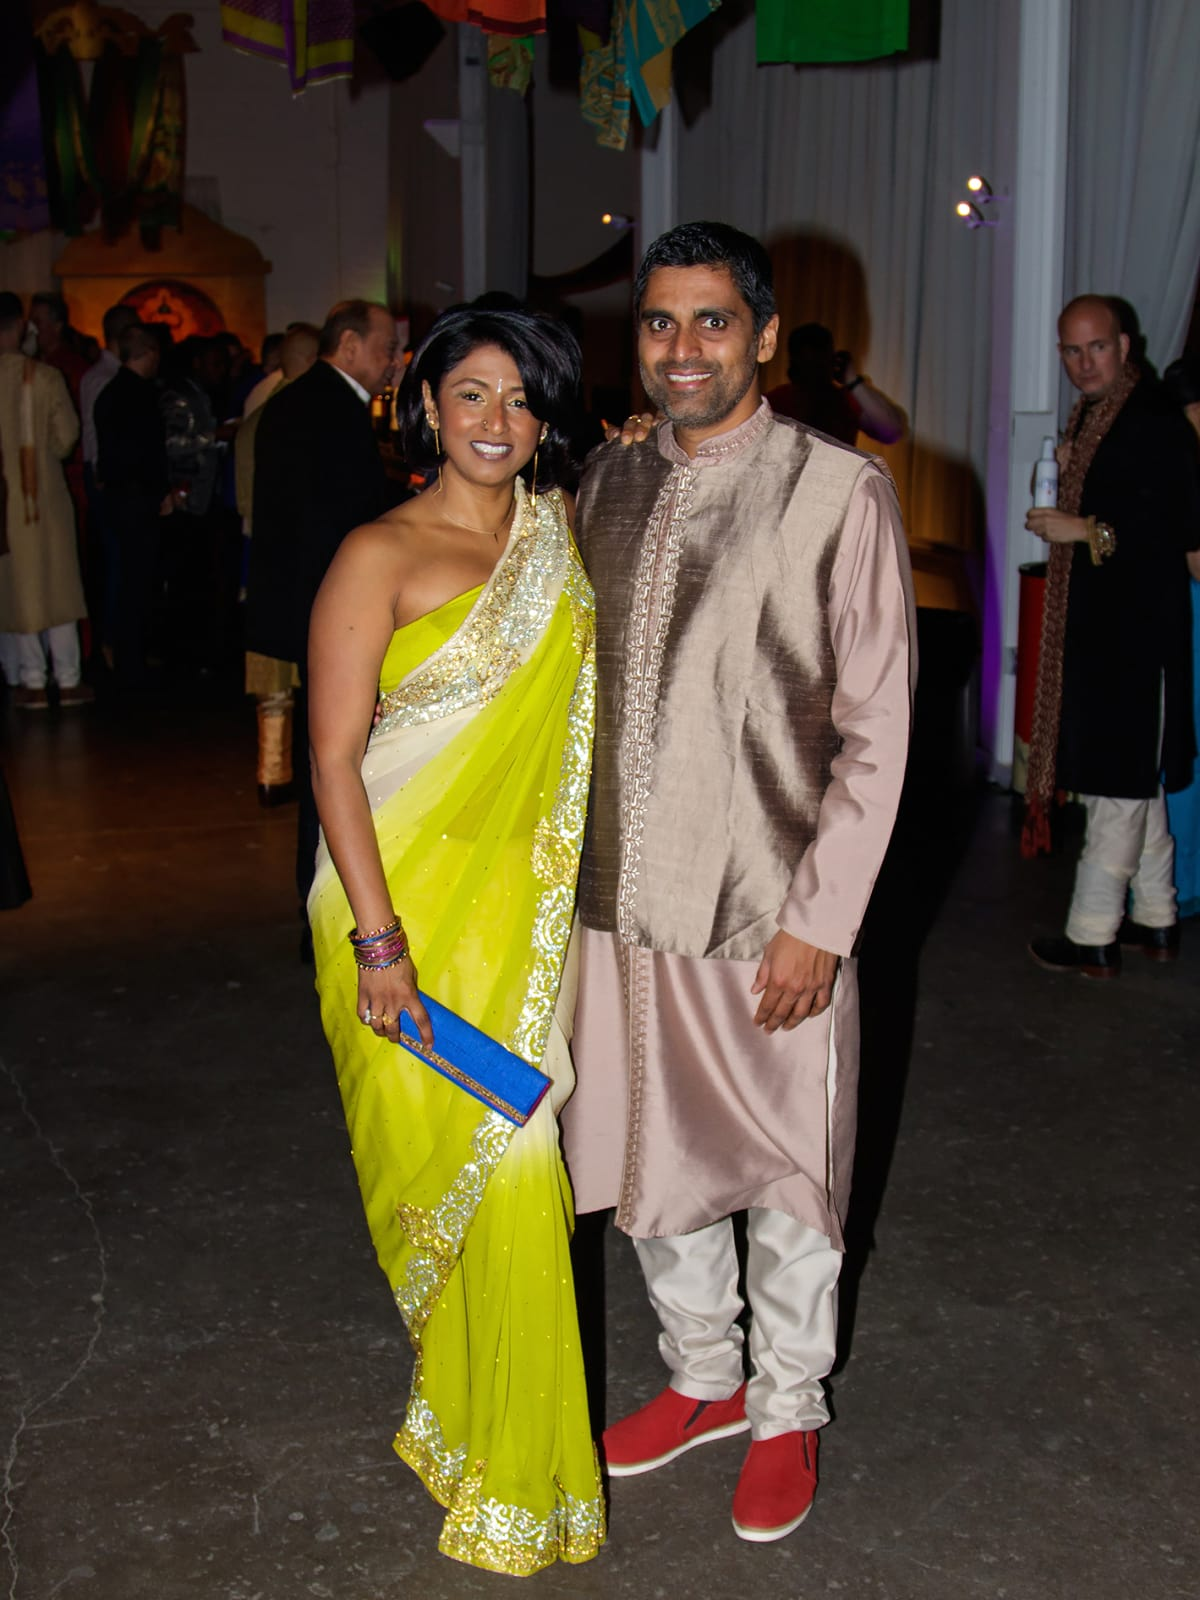 Dr. Chrisette Dharma, Sanjay Pamurthy